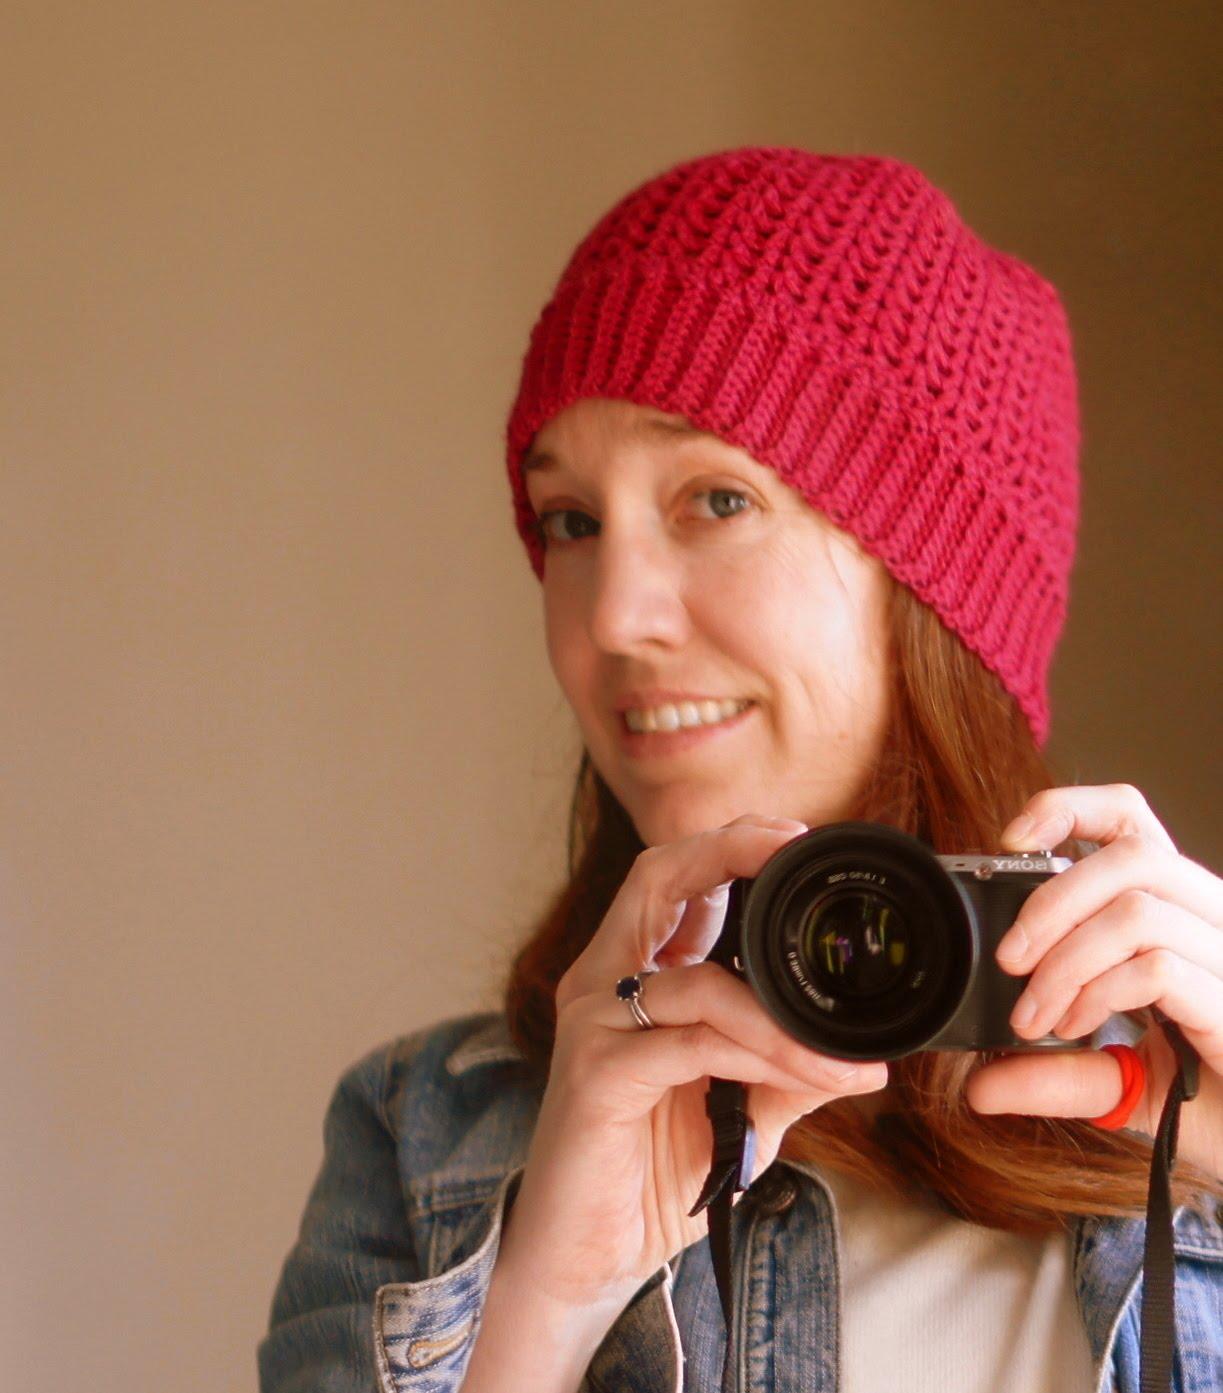 Ball Hank n  Skein  Free Crochet Hat Pattern - The Perfect V-Stitch Hat 3d67913450d